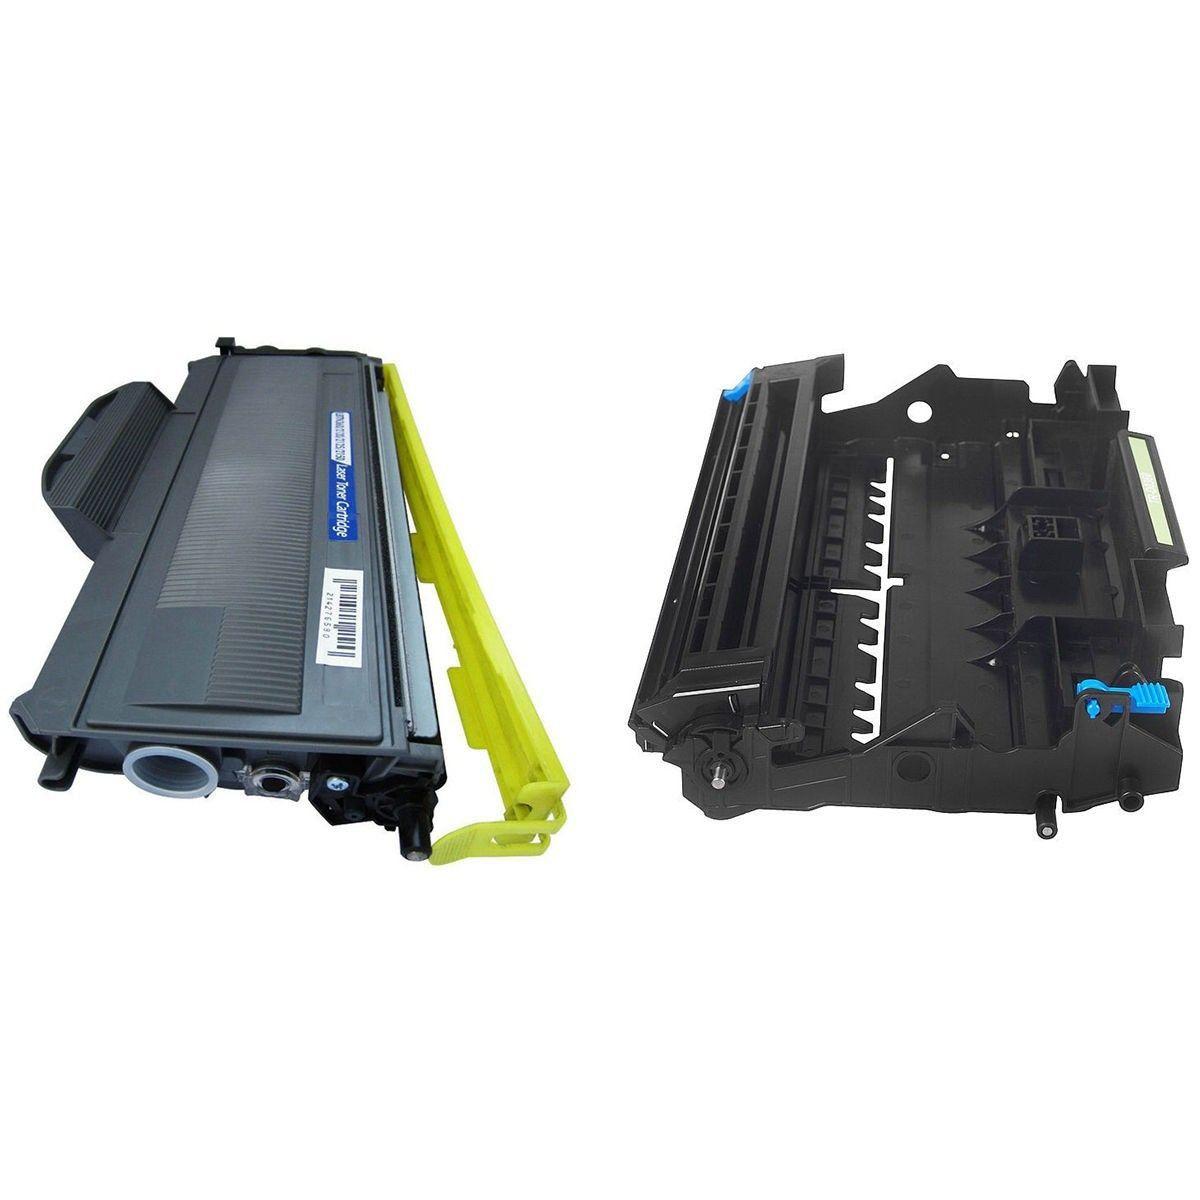 Compatível: Combo Fotocondutor DR360 + Toner TN360 para Brother HL-2140 HL-2150 DCP-7030 DCP-7040 MFC-7320 MFC-7440